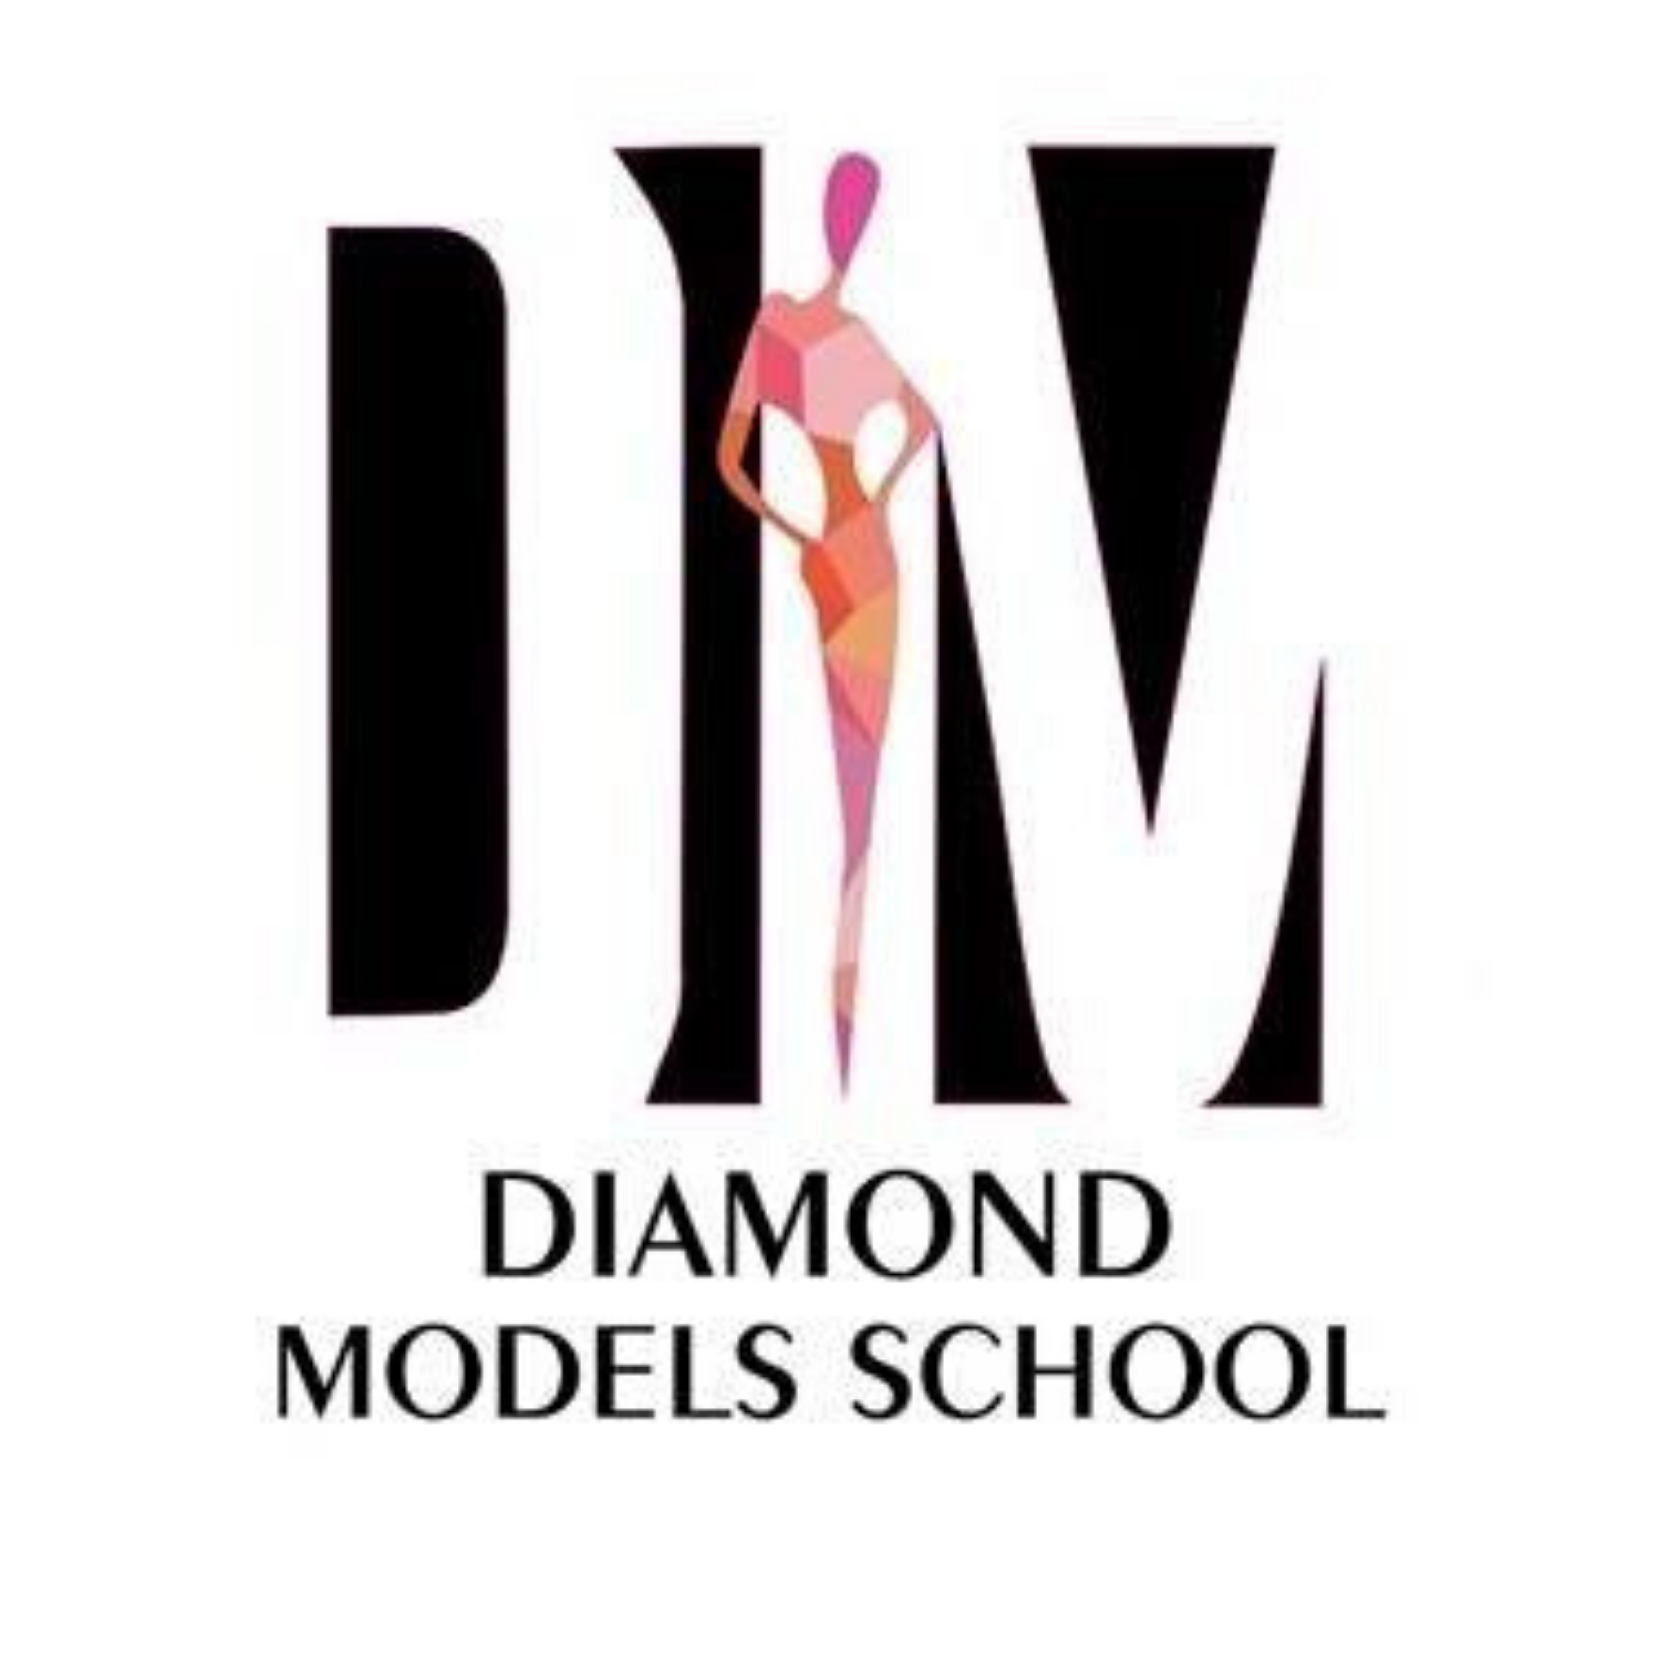 http://dfashionmagazine.com/DIAMOND MODELS SCHOOL